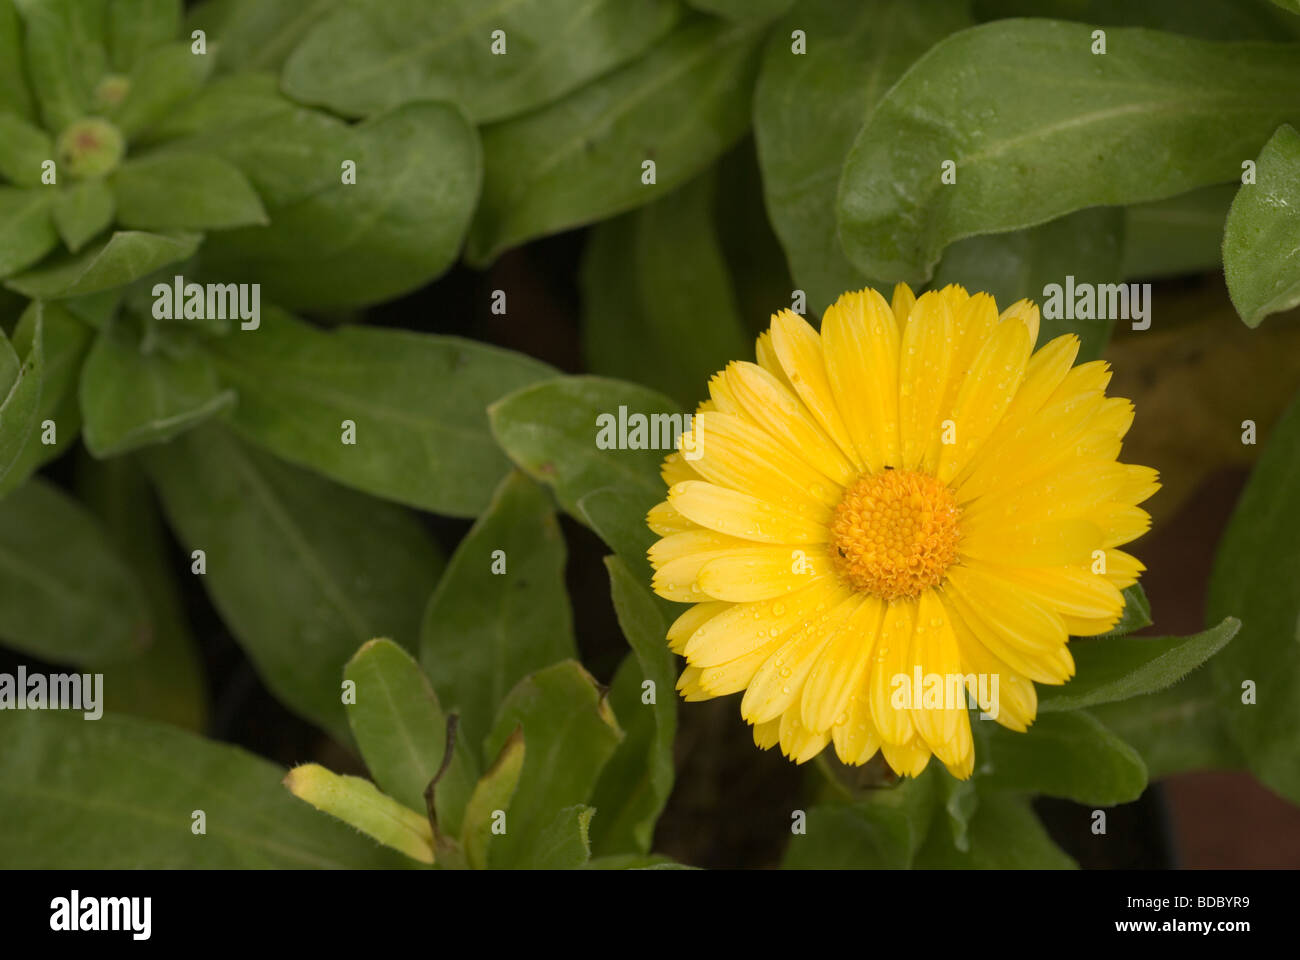 Flower of Calendula officinalis, Asteraceae - Stock Image